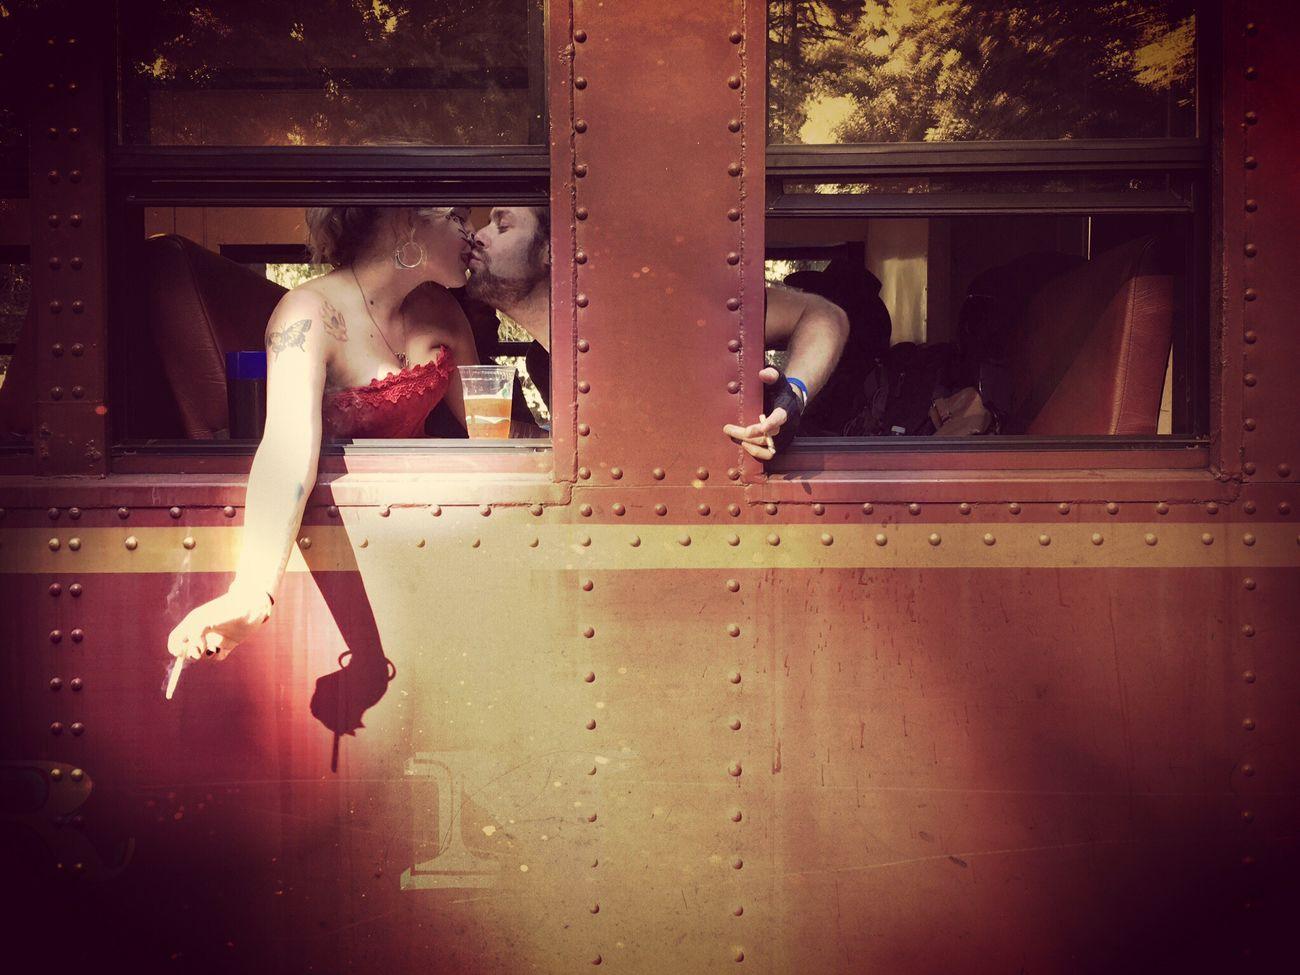 Train Ride Not My Pic Cuteness Lifestyles Smoking Girl Boy Kiss Train Skunk Train Skunk Train Willits California To Fort Bragg California California Love